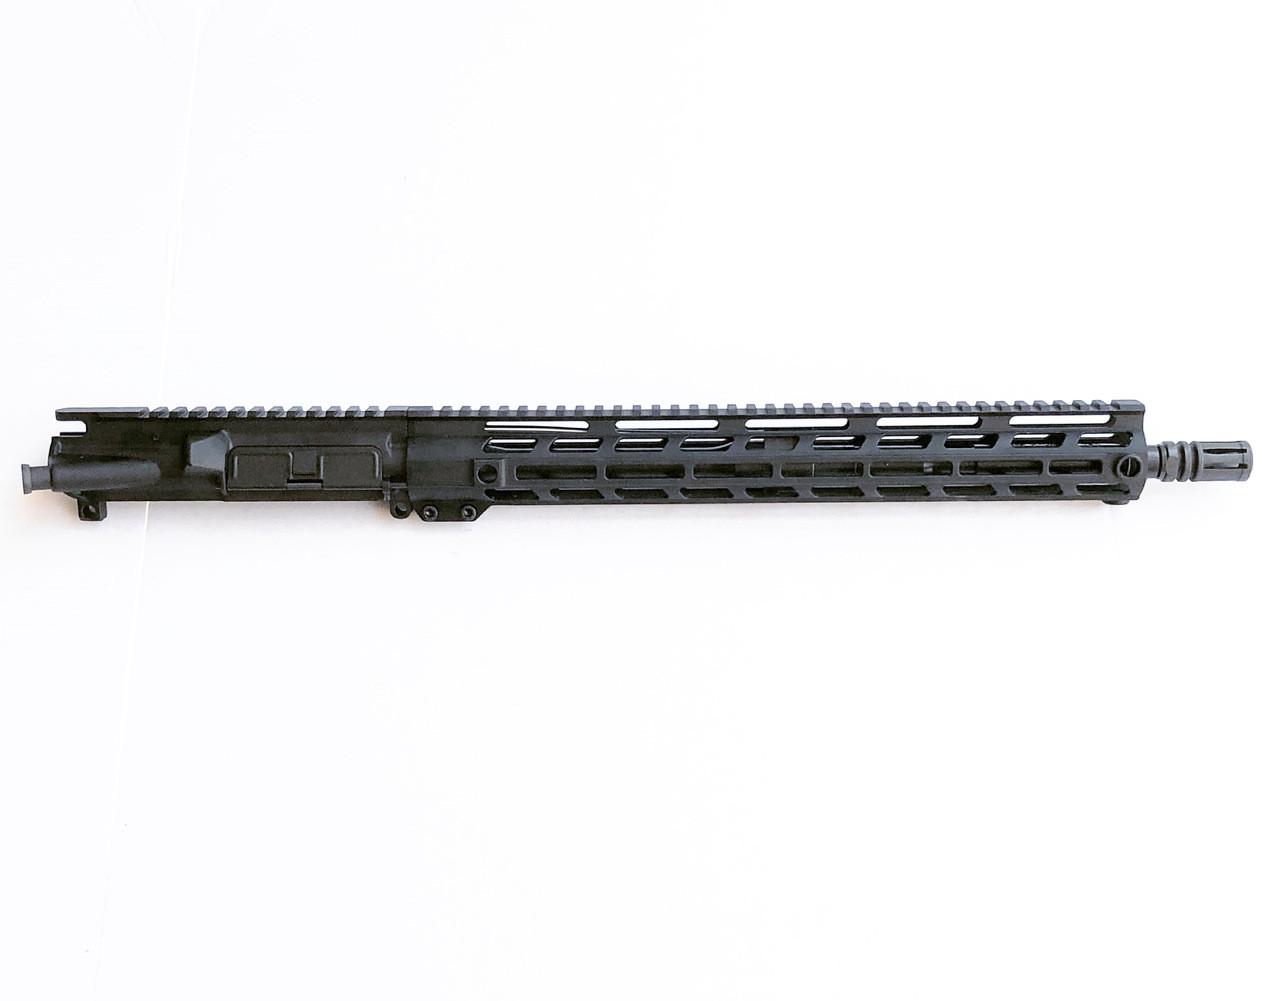 "MCS AR-15 Upper Receiver, .300 Blackout, 16"" Parkerized Heavy Barrel, 1:8 Twist, Pistol Gas System"